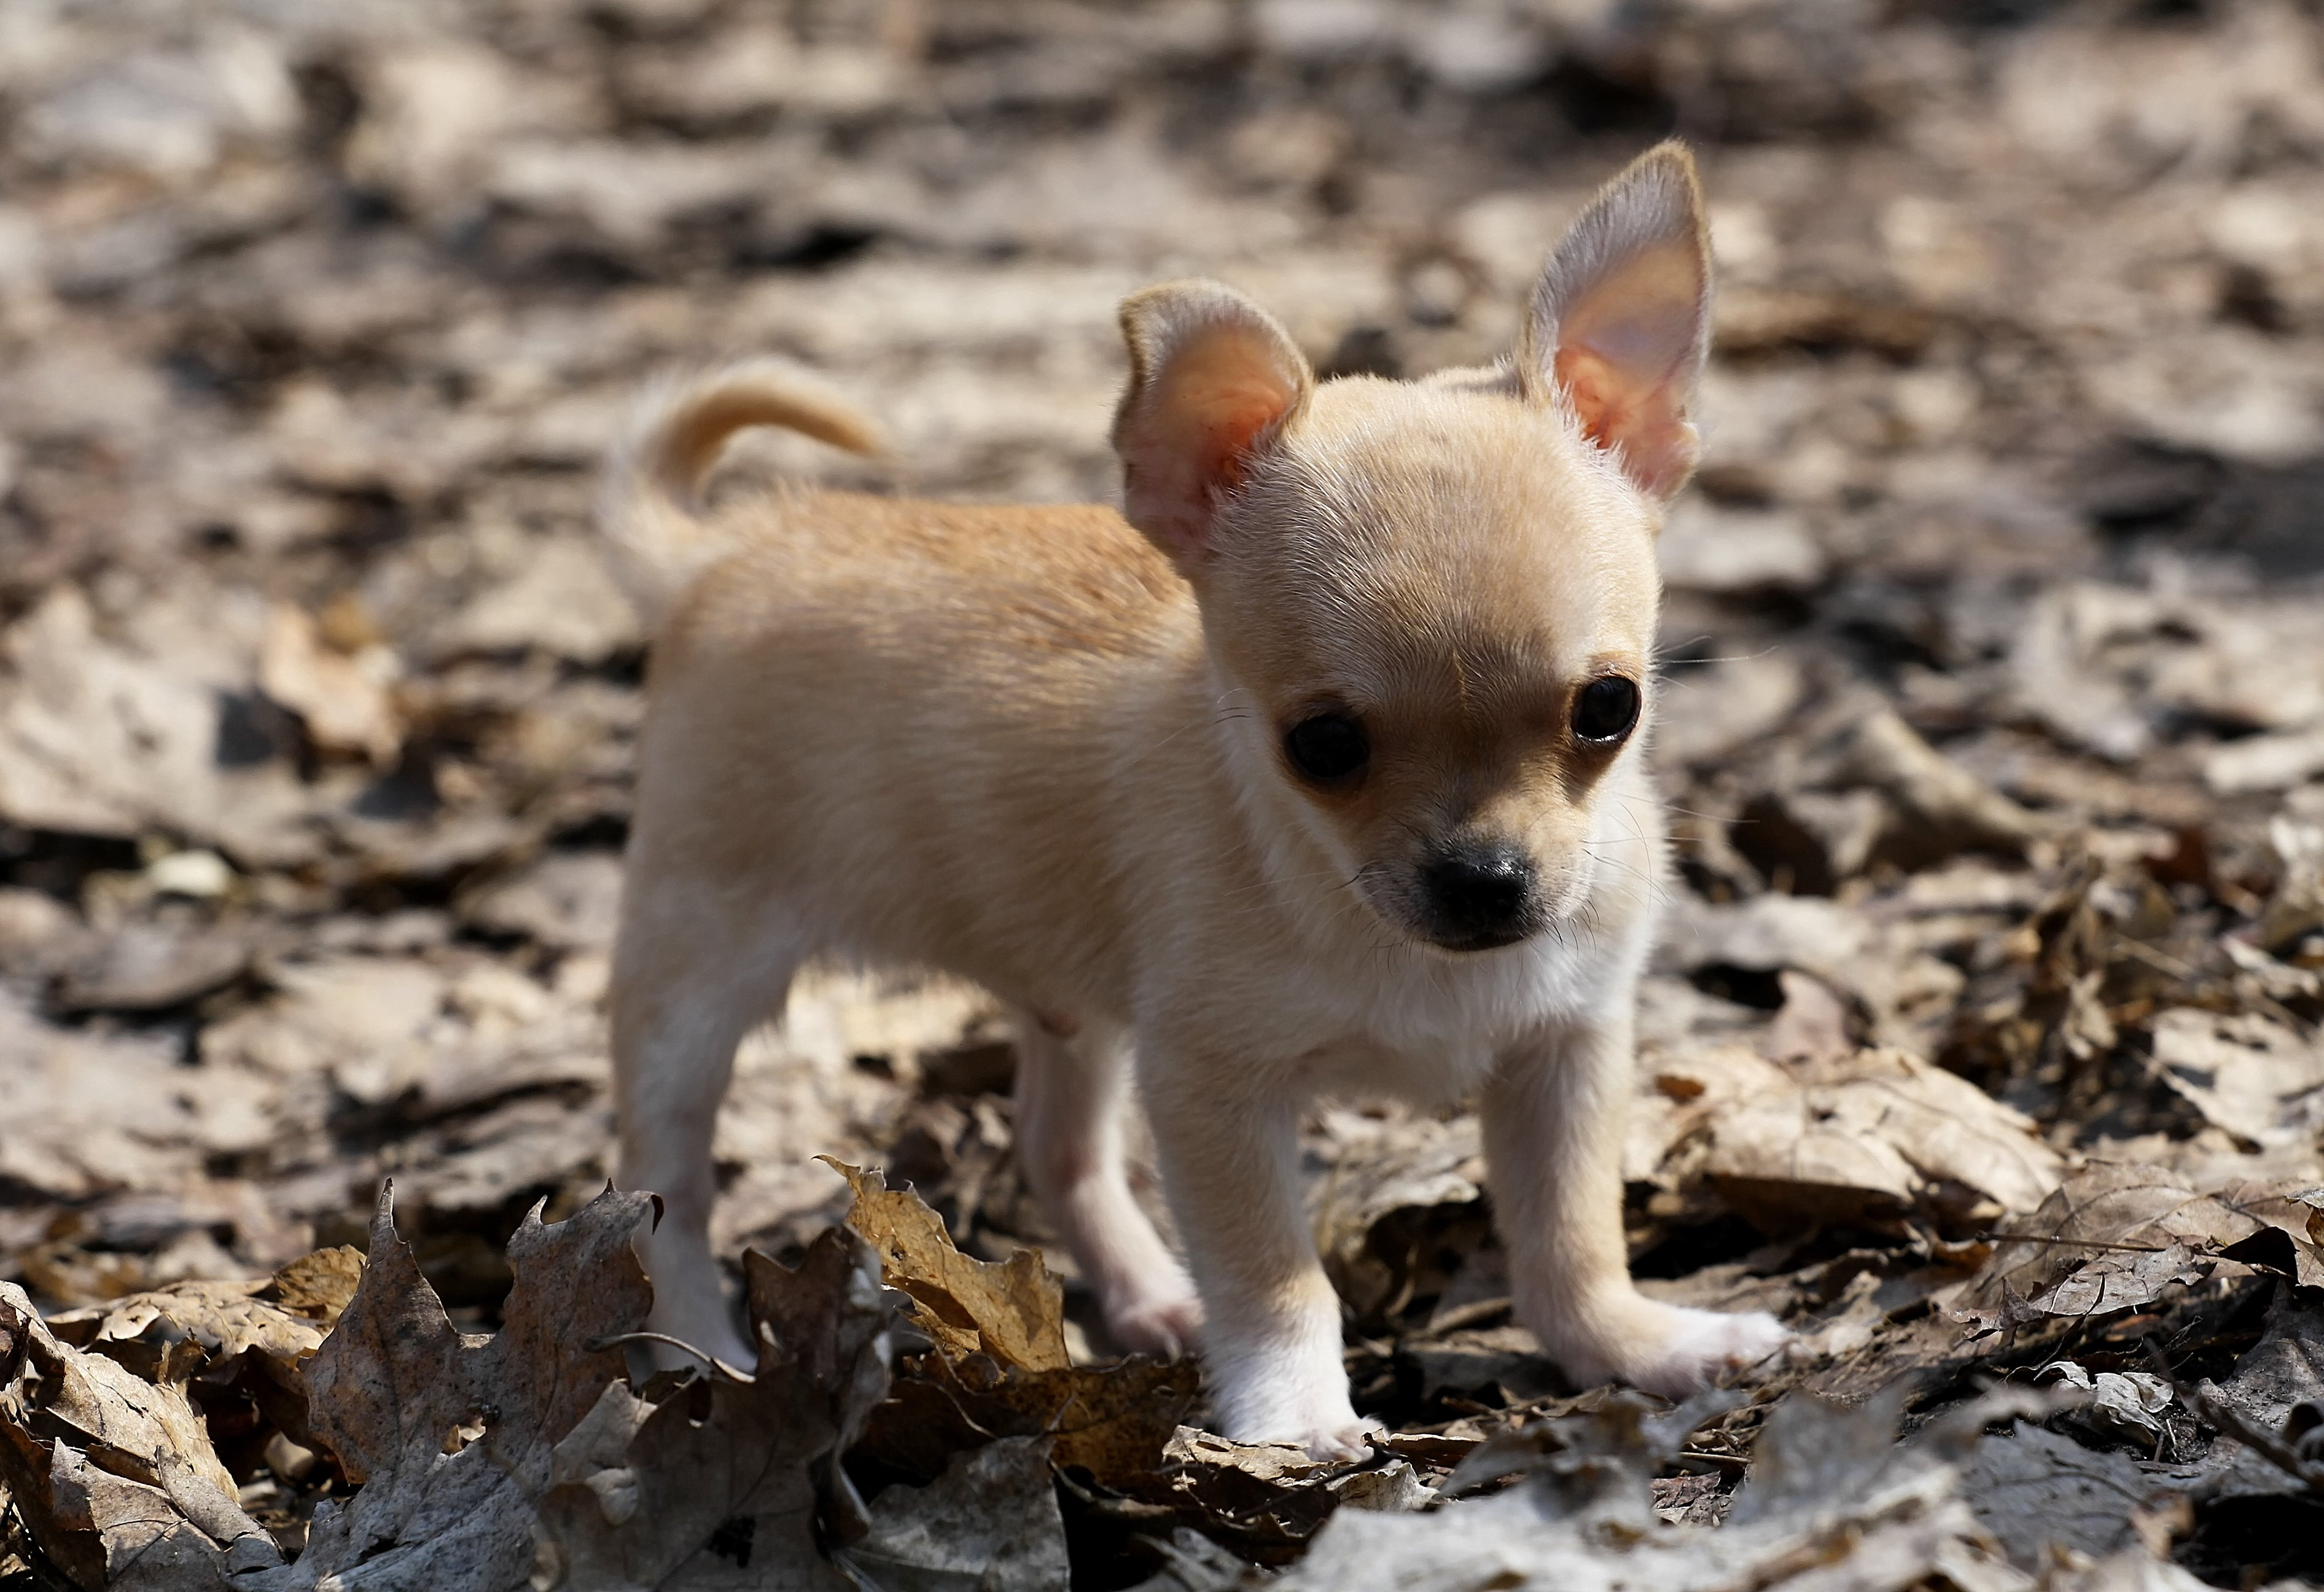 dog chihuahua background - photo #16